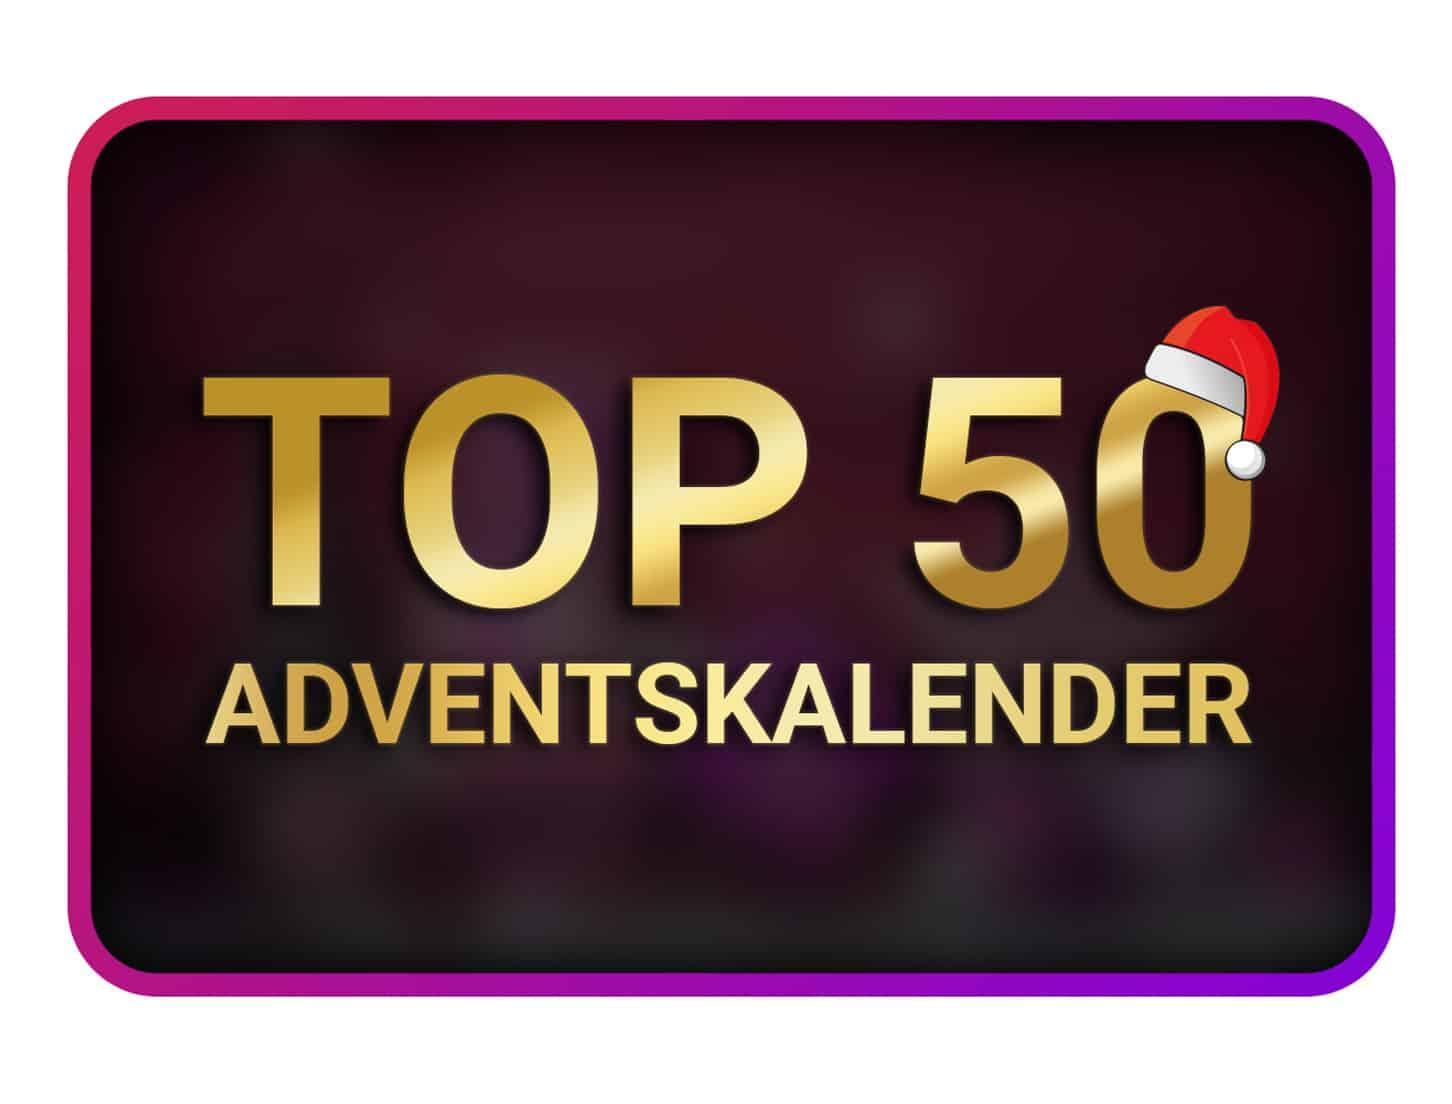 Adventskalender-top-50-2021